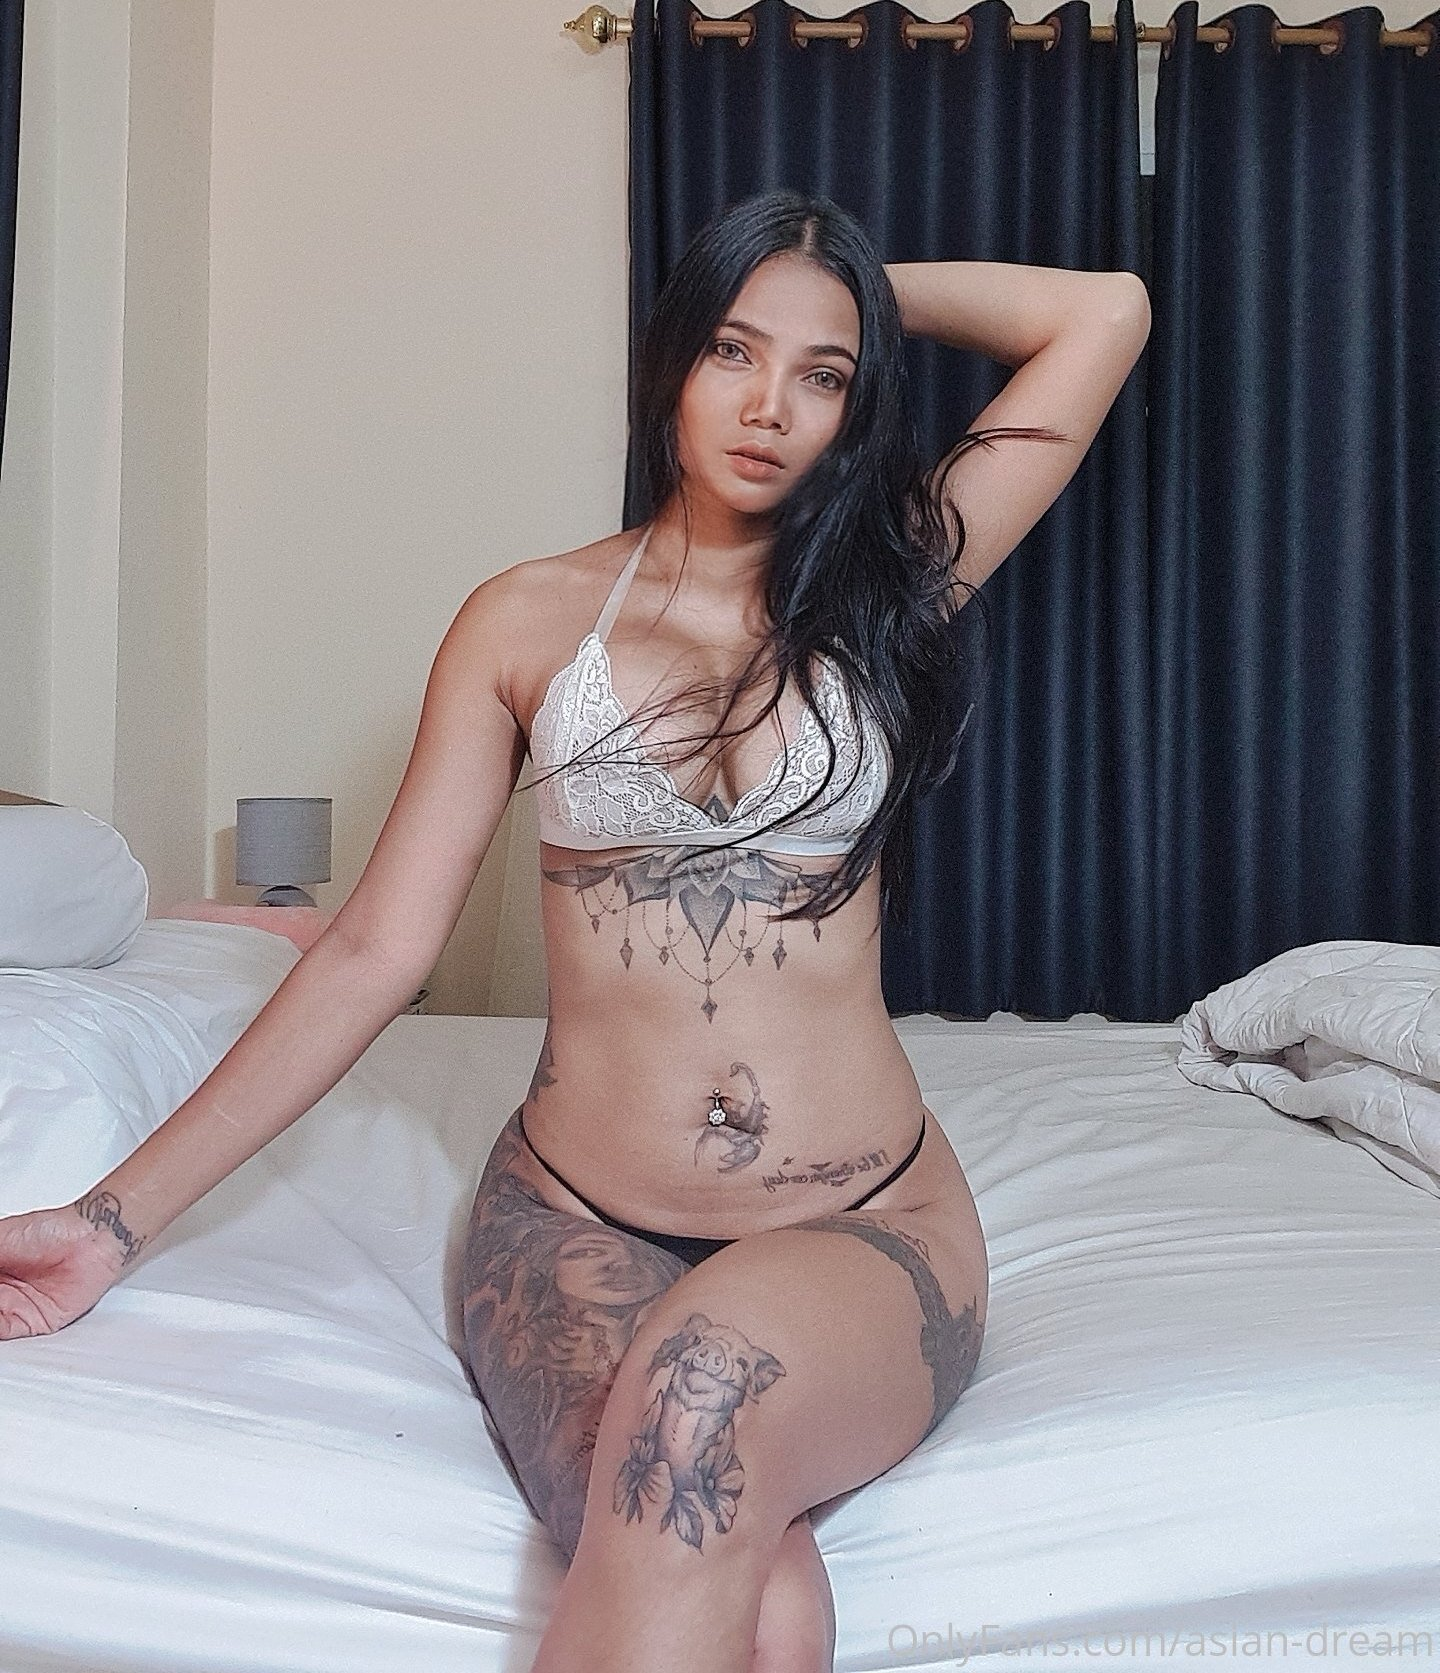 Asian Dream Onlyfans Sexy Leaks 0029